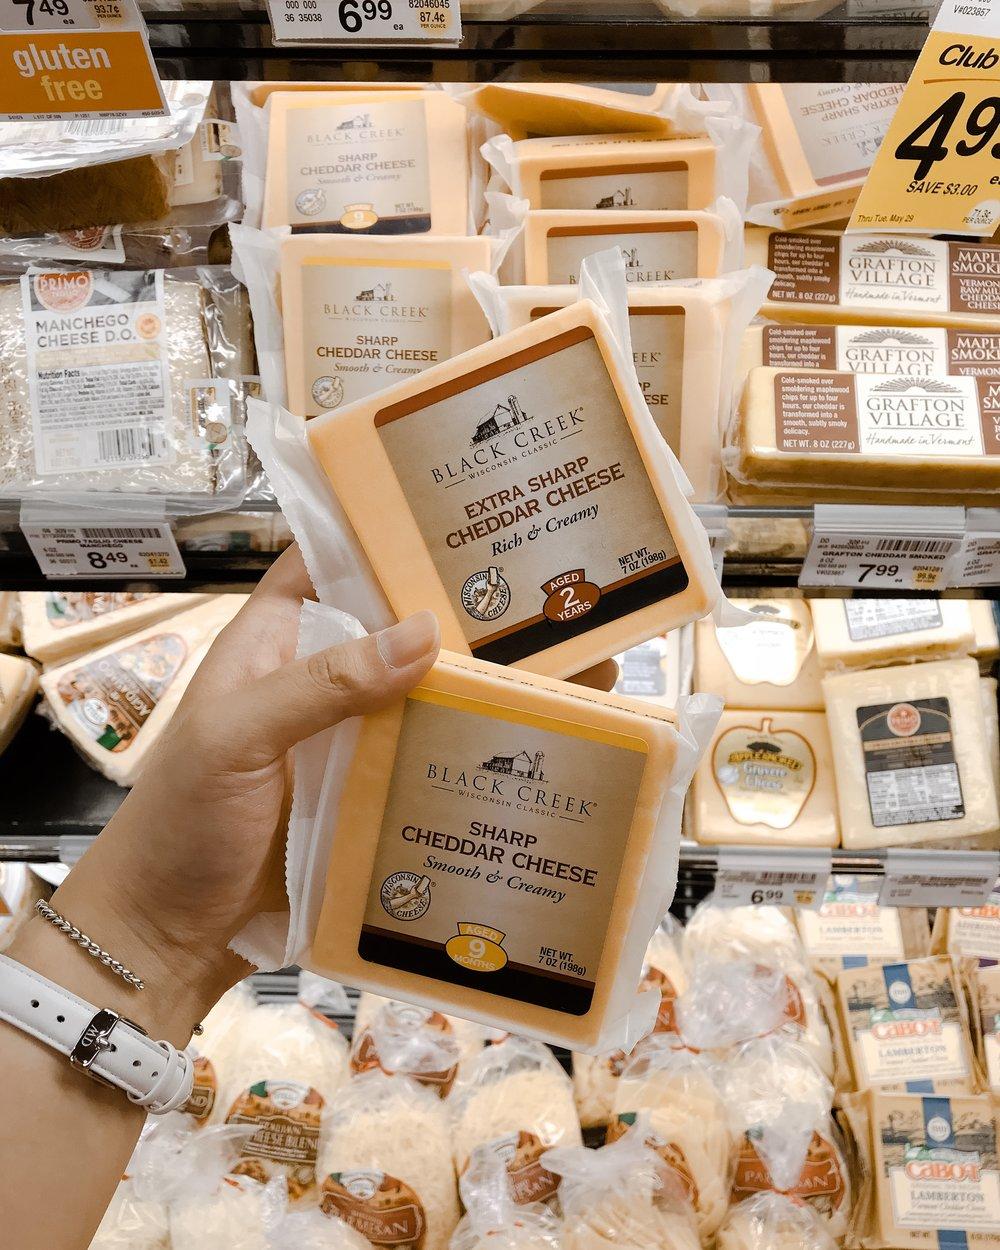 Black Creek Cheese - Cheddar Cheese